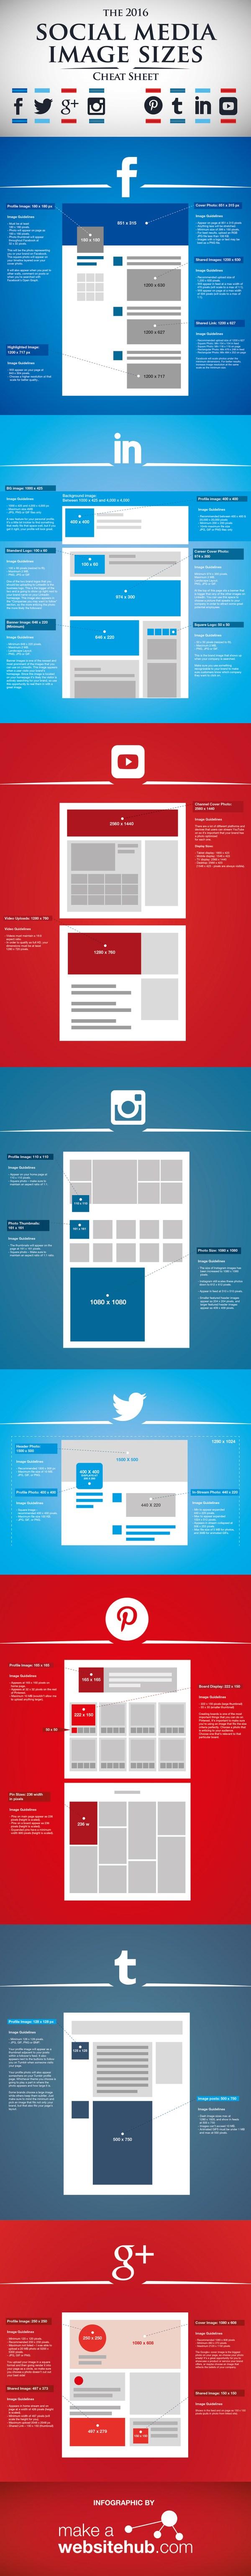 2016 Social Media Image Sizes Cheat Sheet